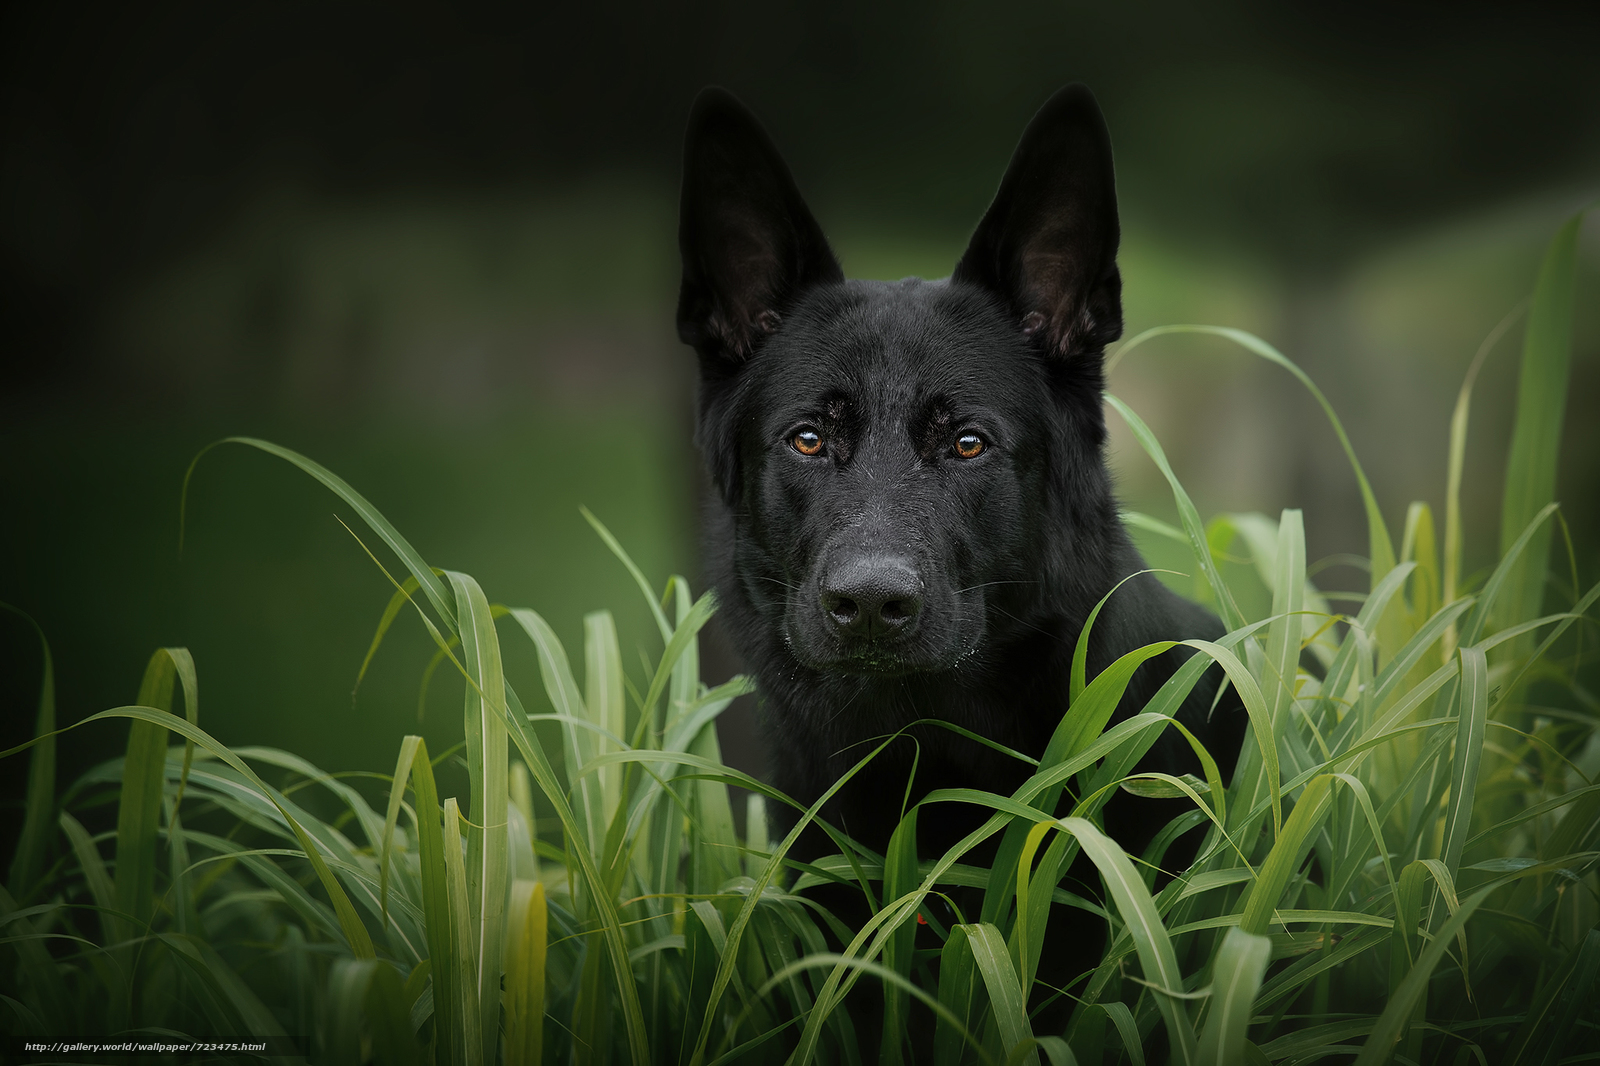 German Shepherd, dog, muzzle, sight, grass